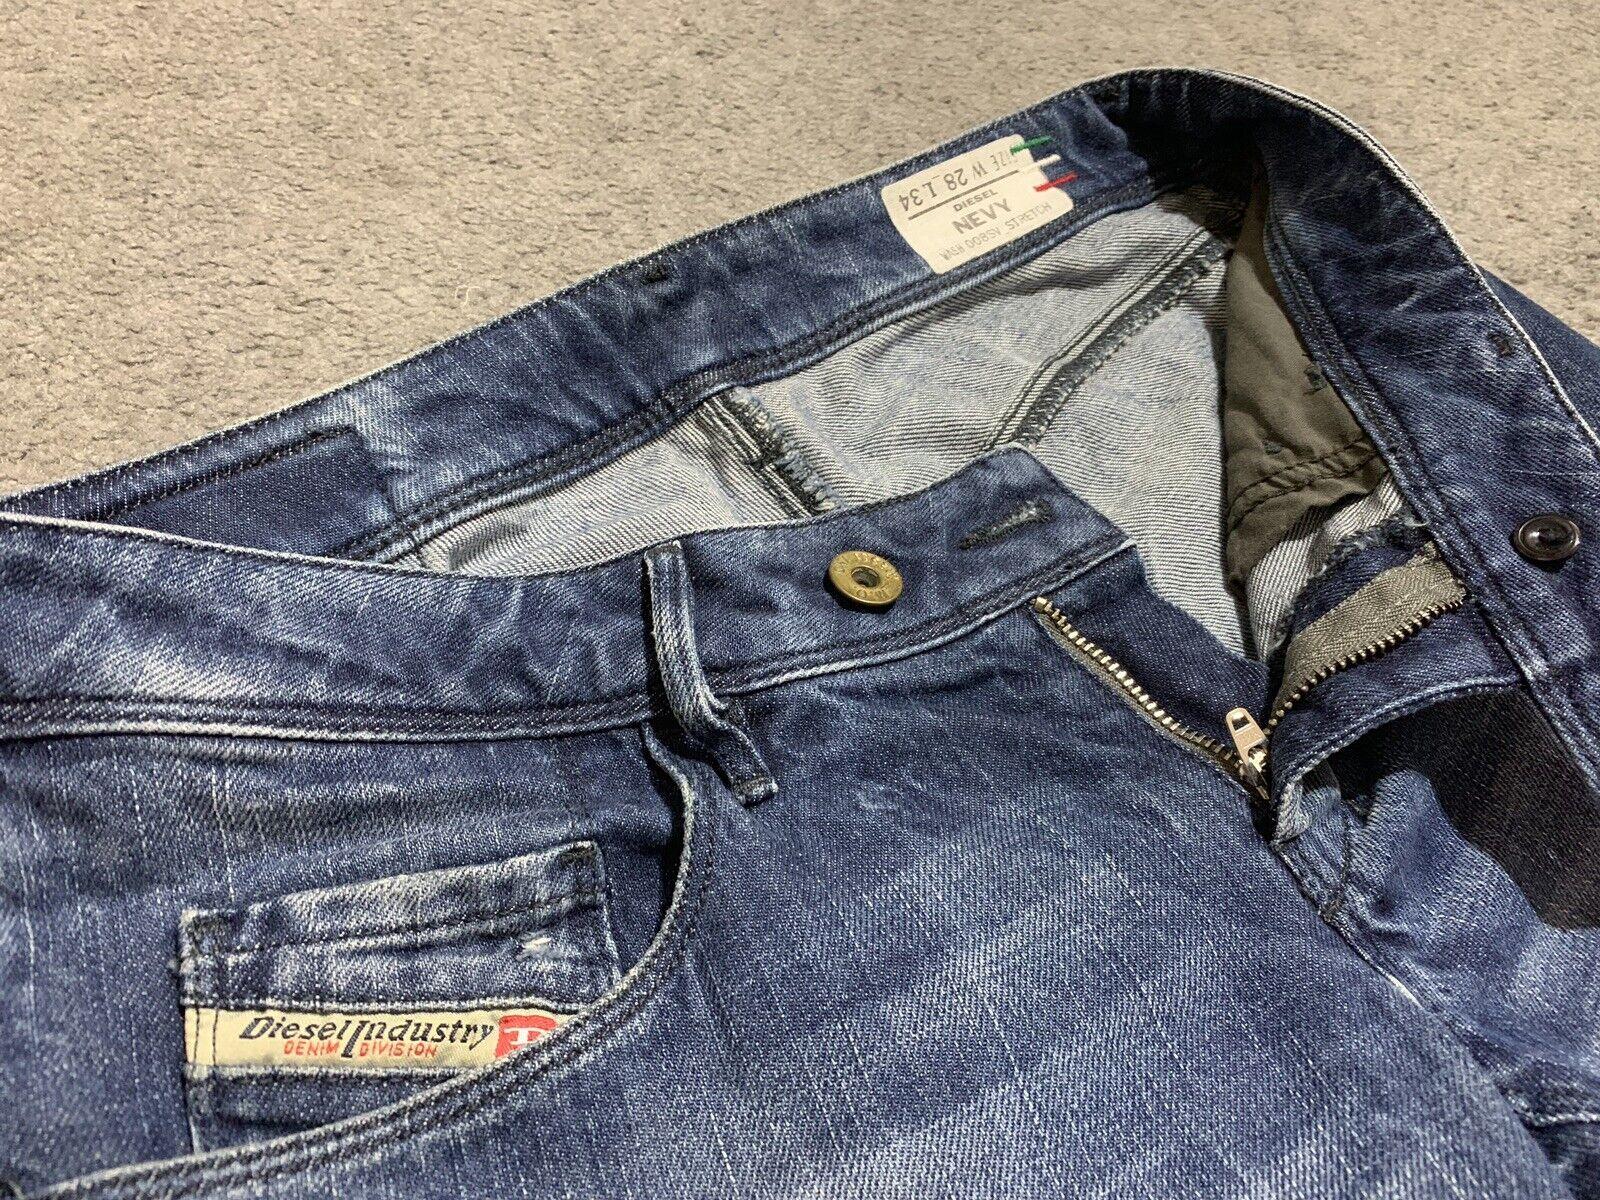 NEVY Wash 008SV DIESEL Stretch Jeans Aderenti W28 L34 in buonissima condizione